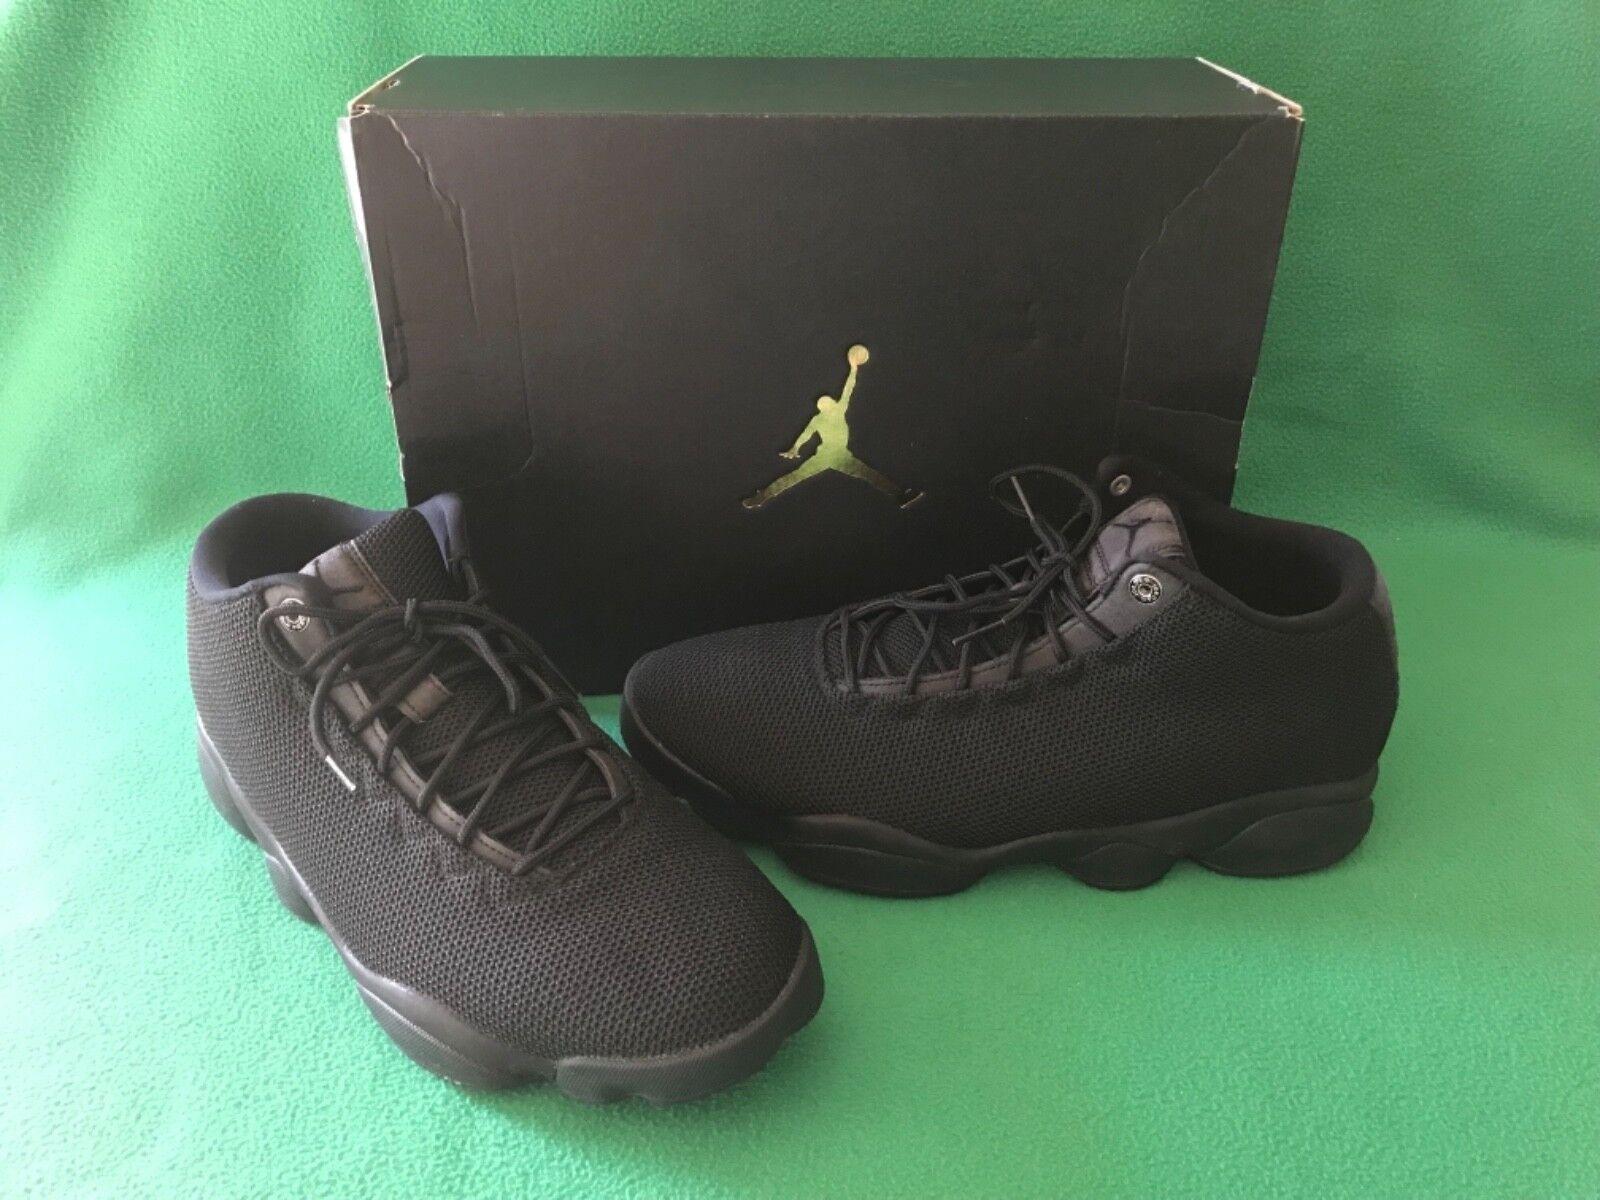 93184c039546 NIKE AIR JORDAN Horizon Low Triple Black Men s Shoes Limited Limited  Limited 845098-010 SIZE